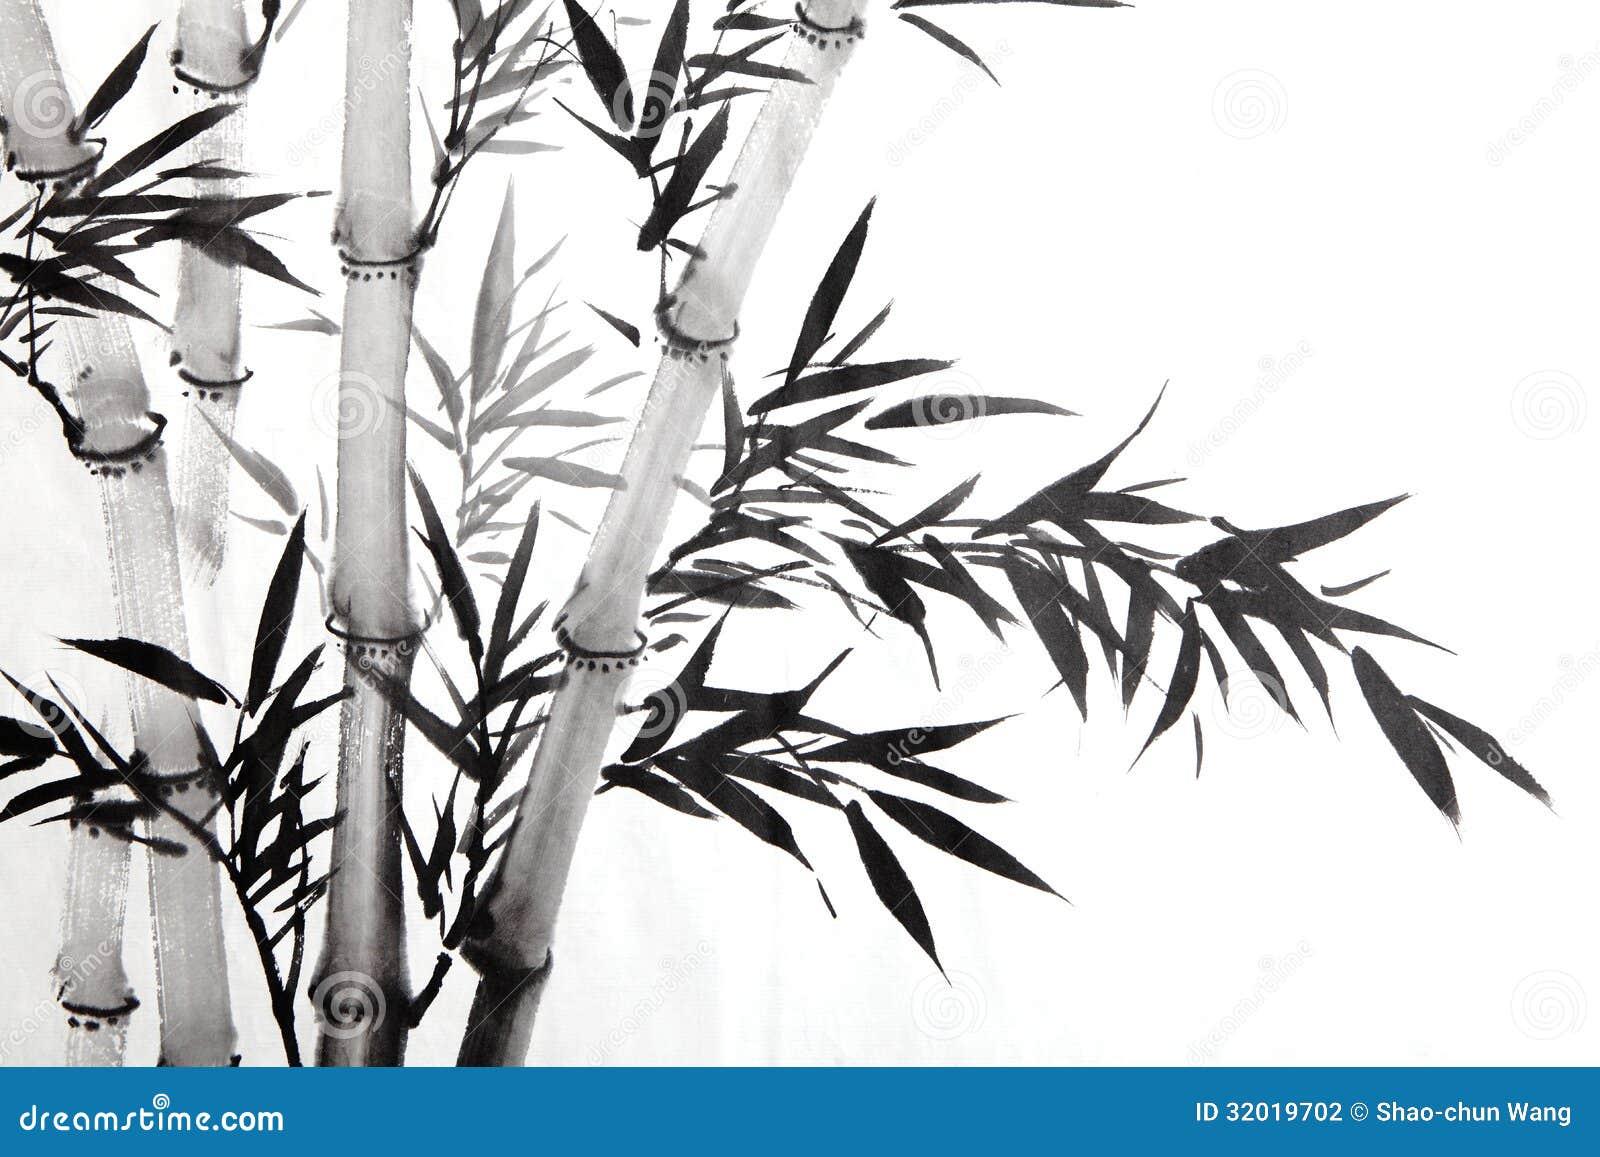 Bamboo Leaf Stock Photography Image 32019702